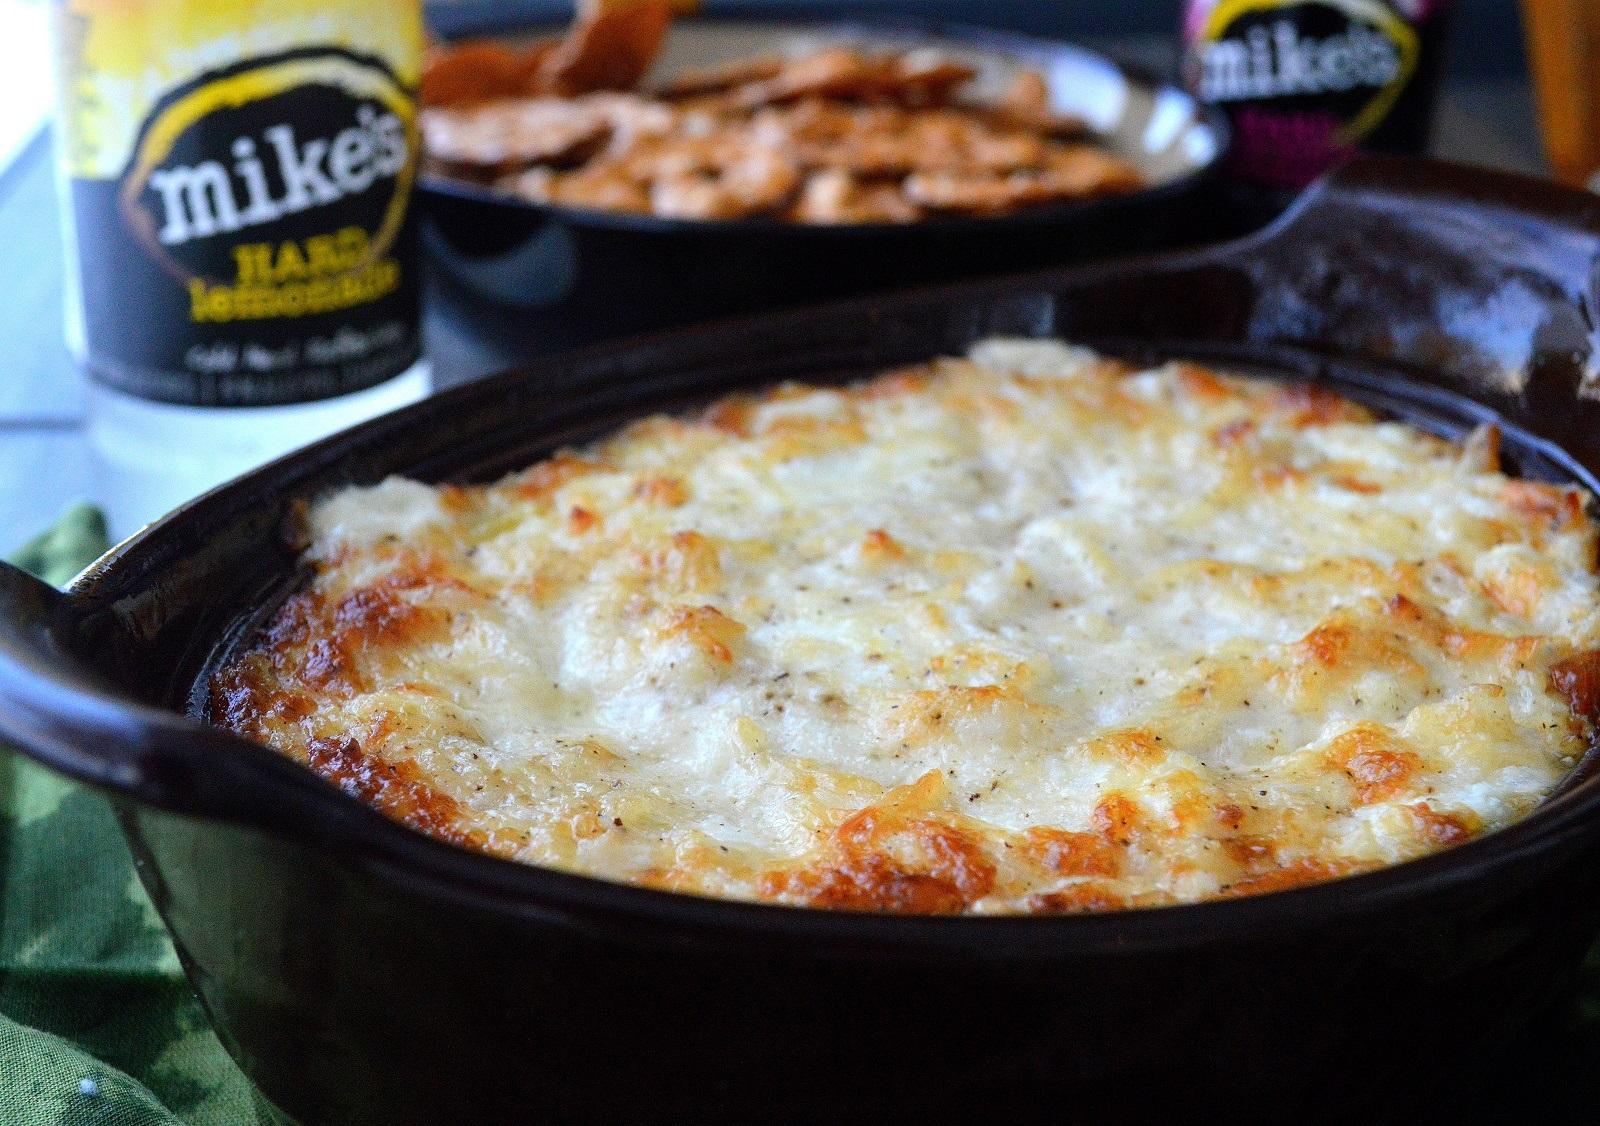 The BEST Hot Onion Dip, just 5 ingredients until YUM!!!